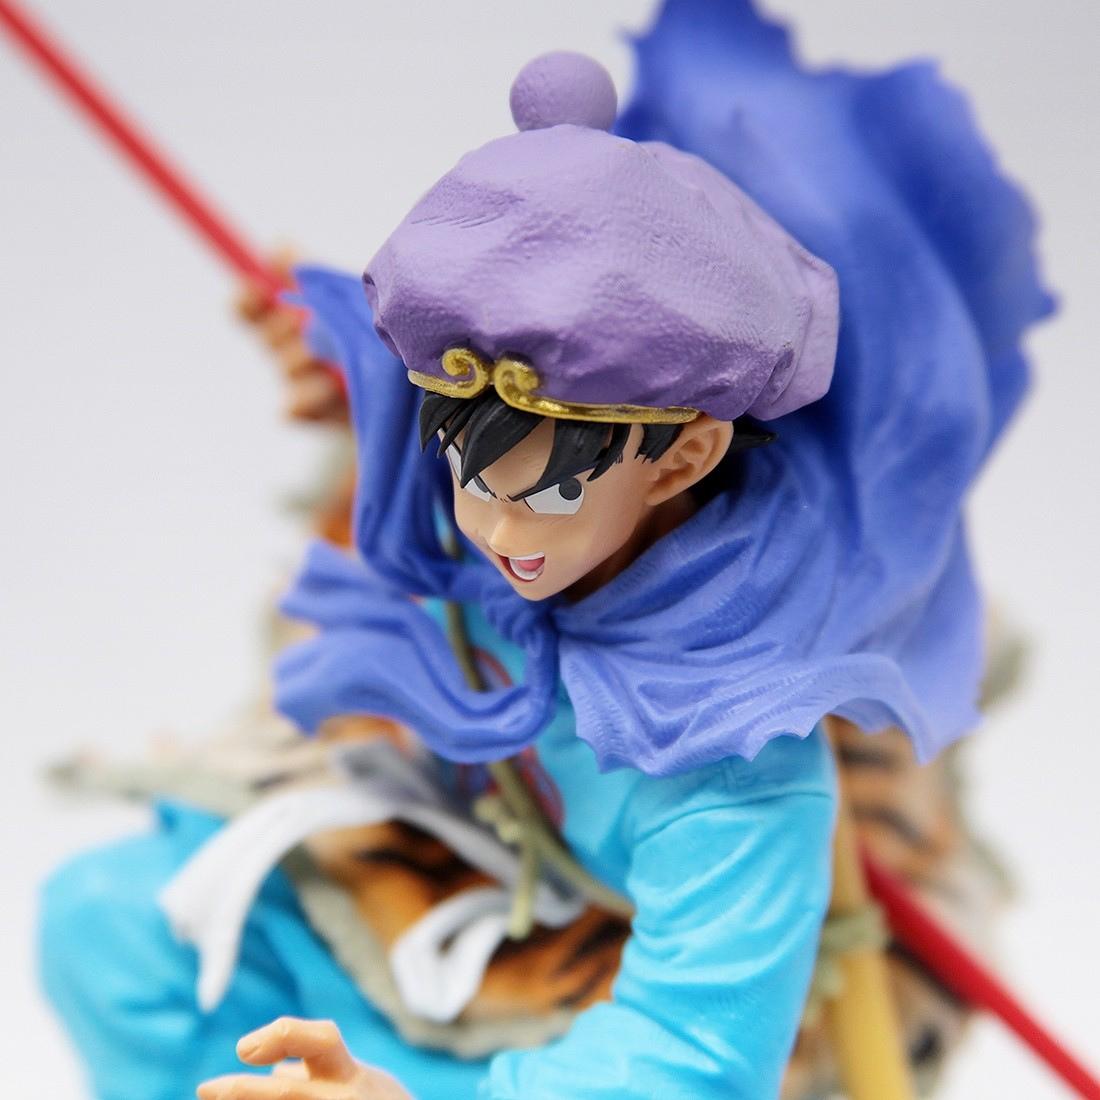 Banpresto Dragon Ball Z World Figure Colosseum Vol. 5 Son Goku